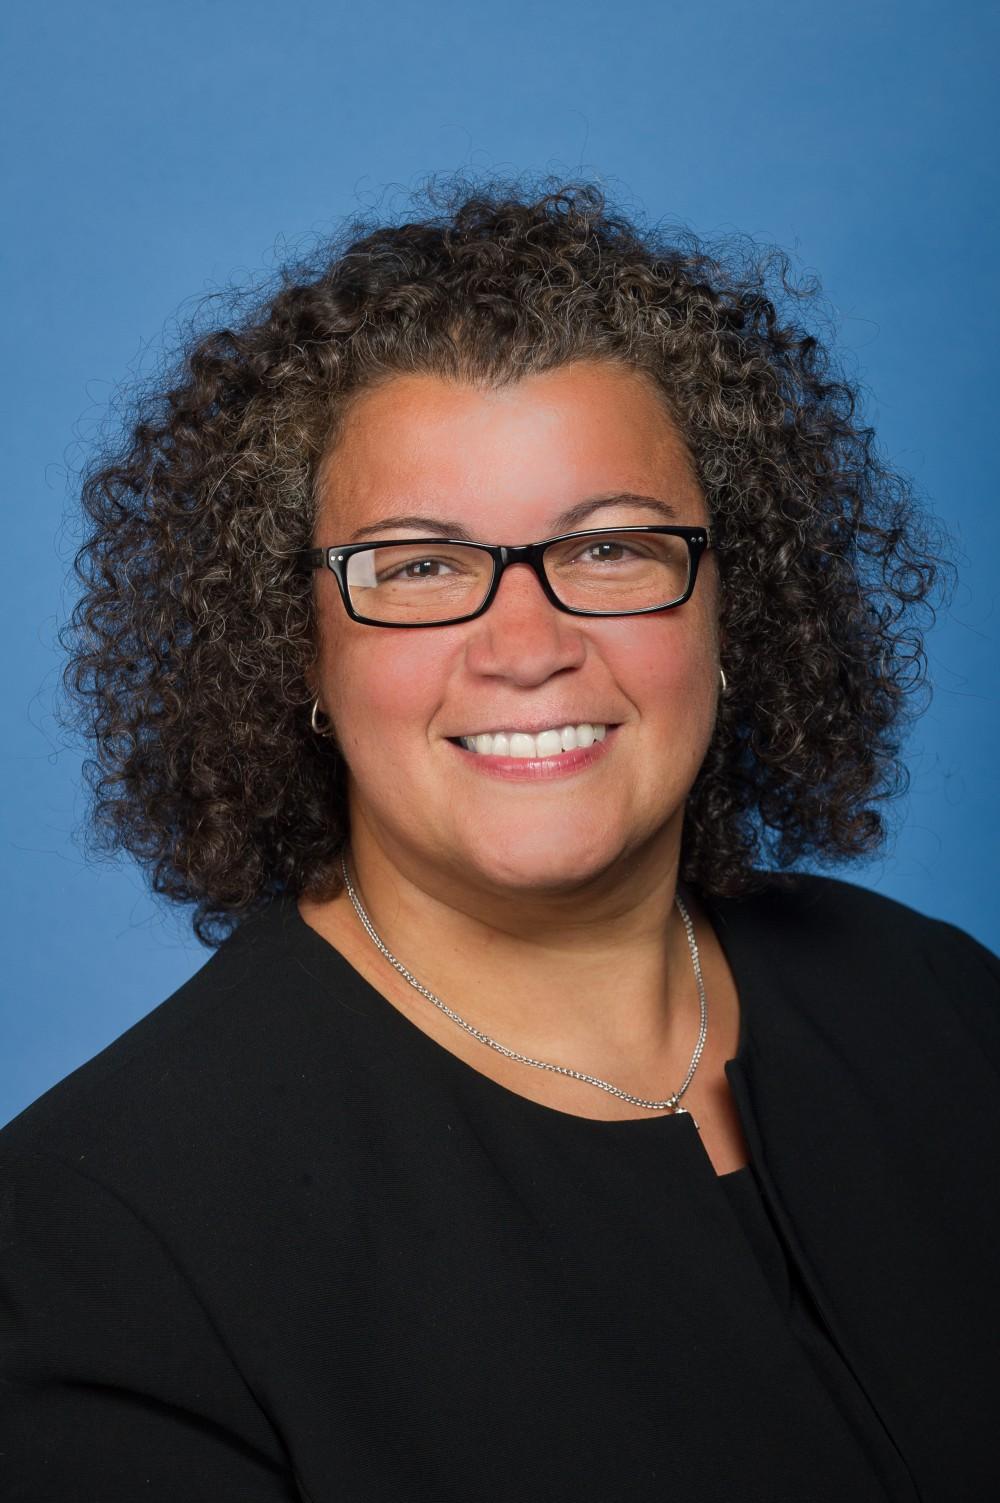 Karen DeMeola